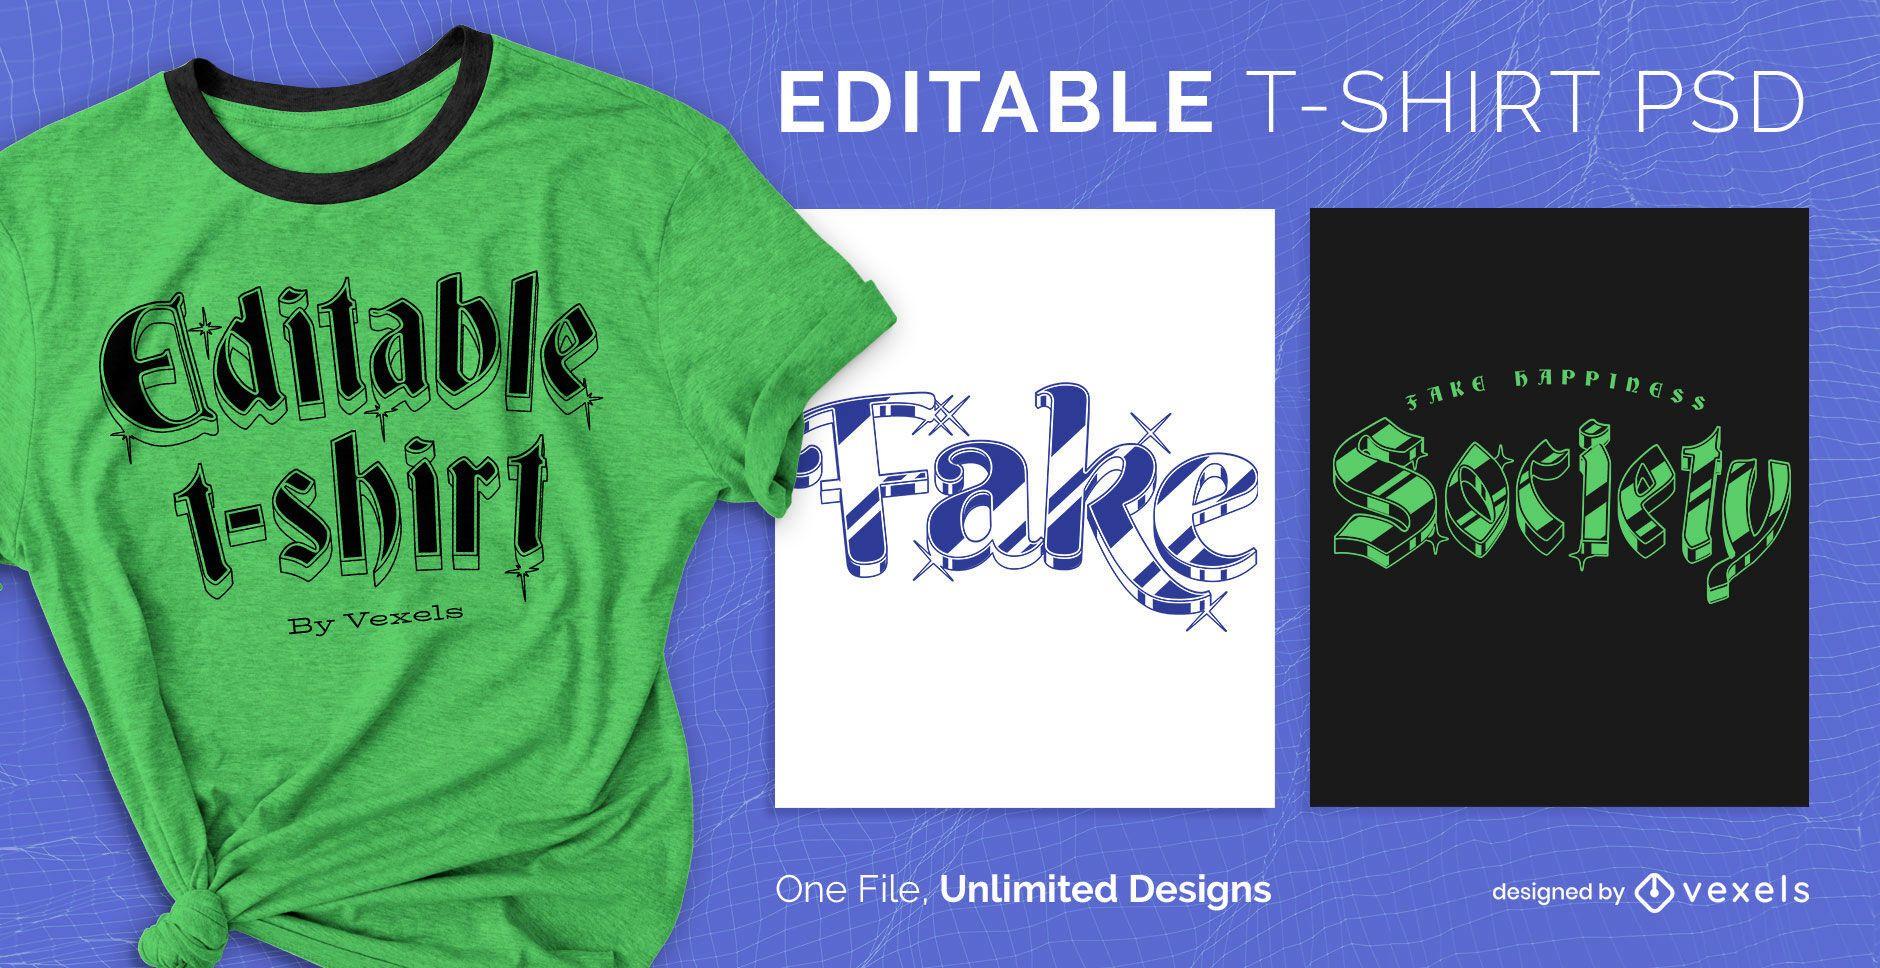 Shiny 3d text scalable t-shirt PSD